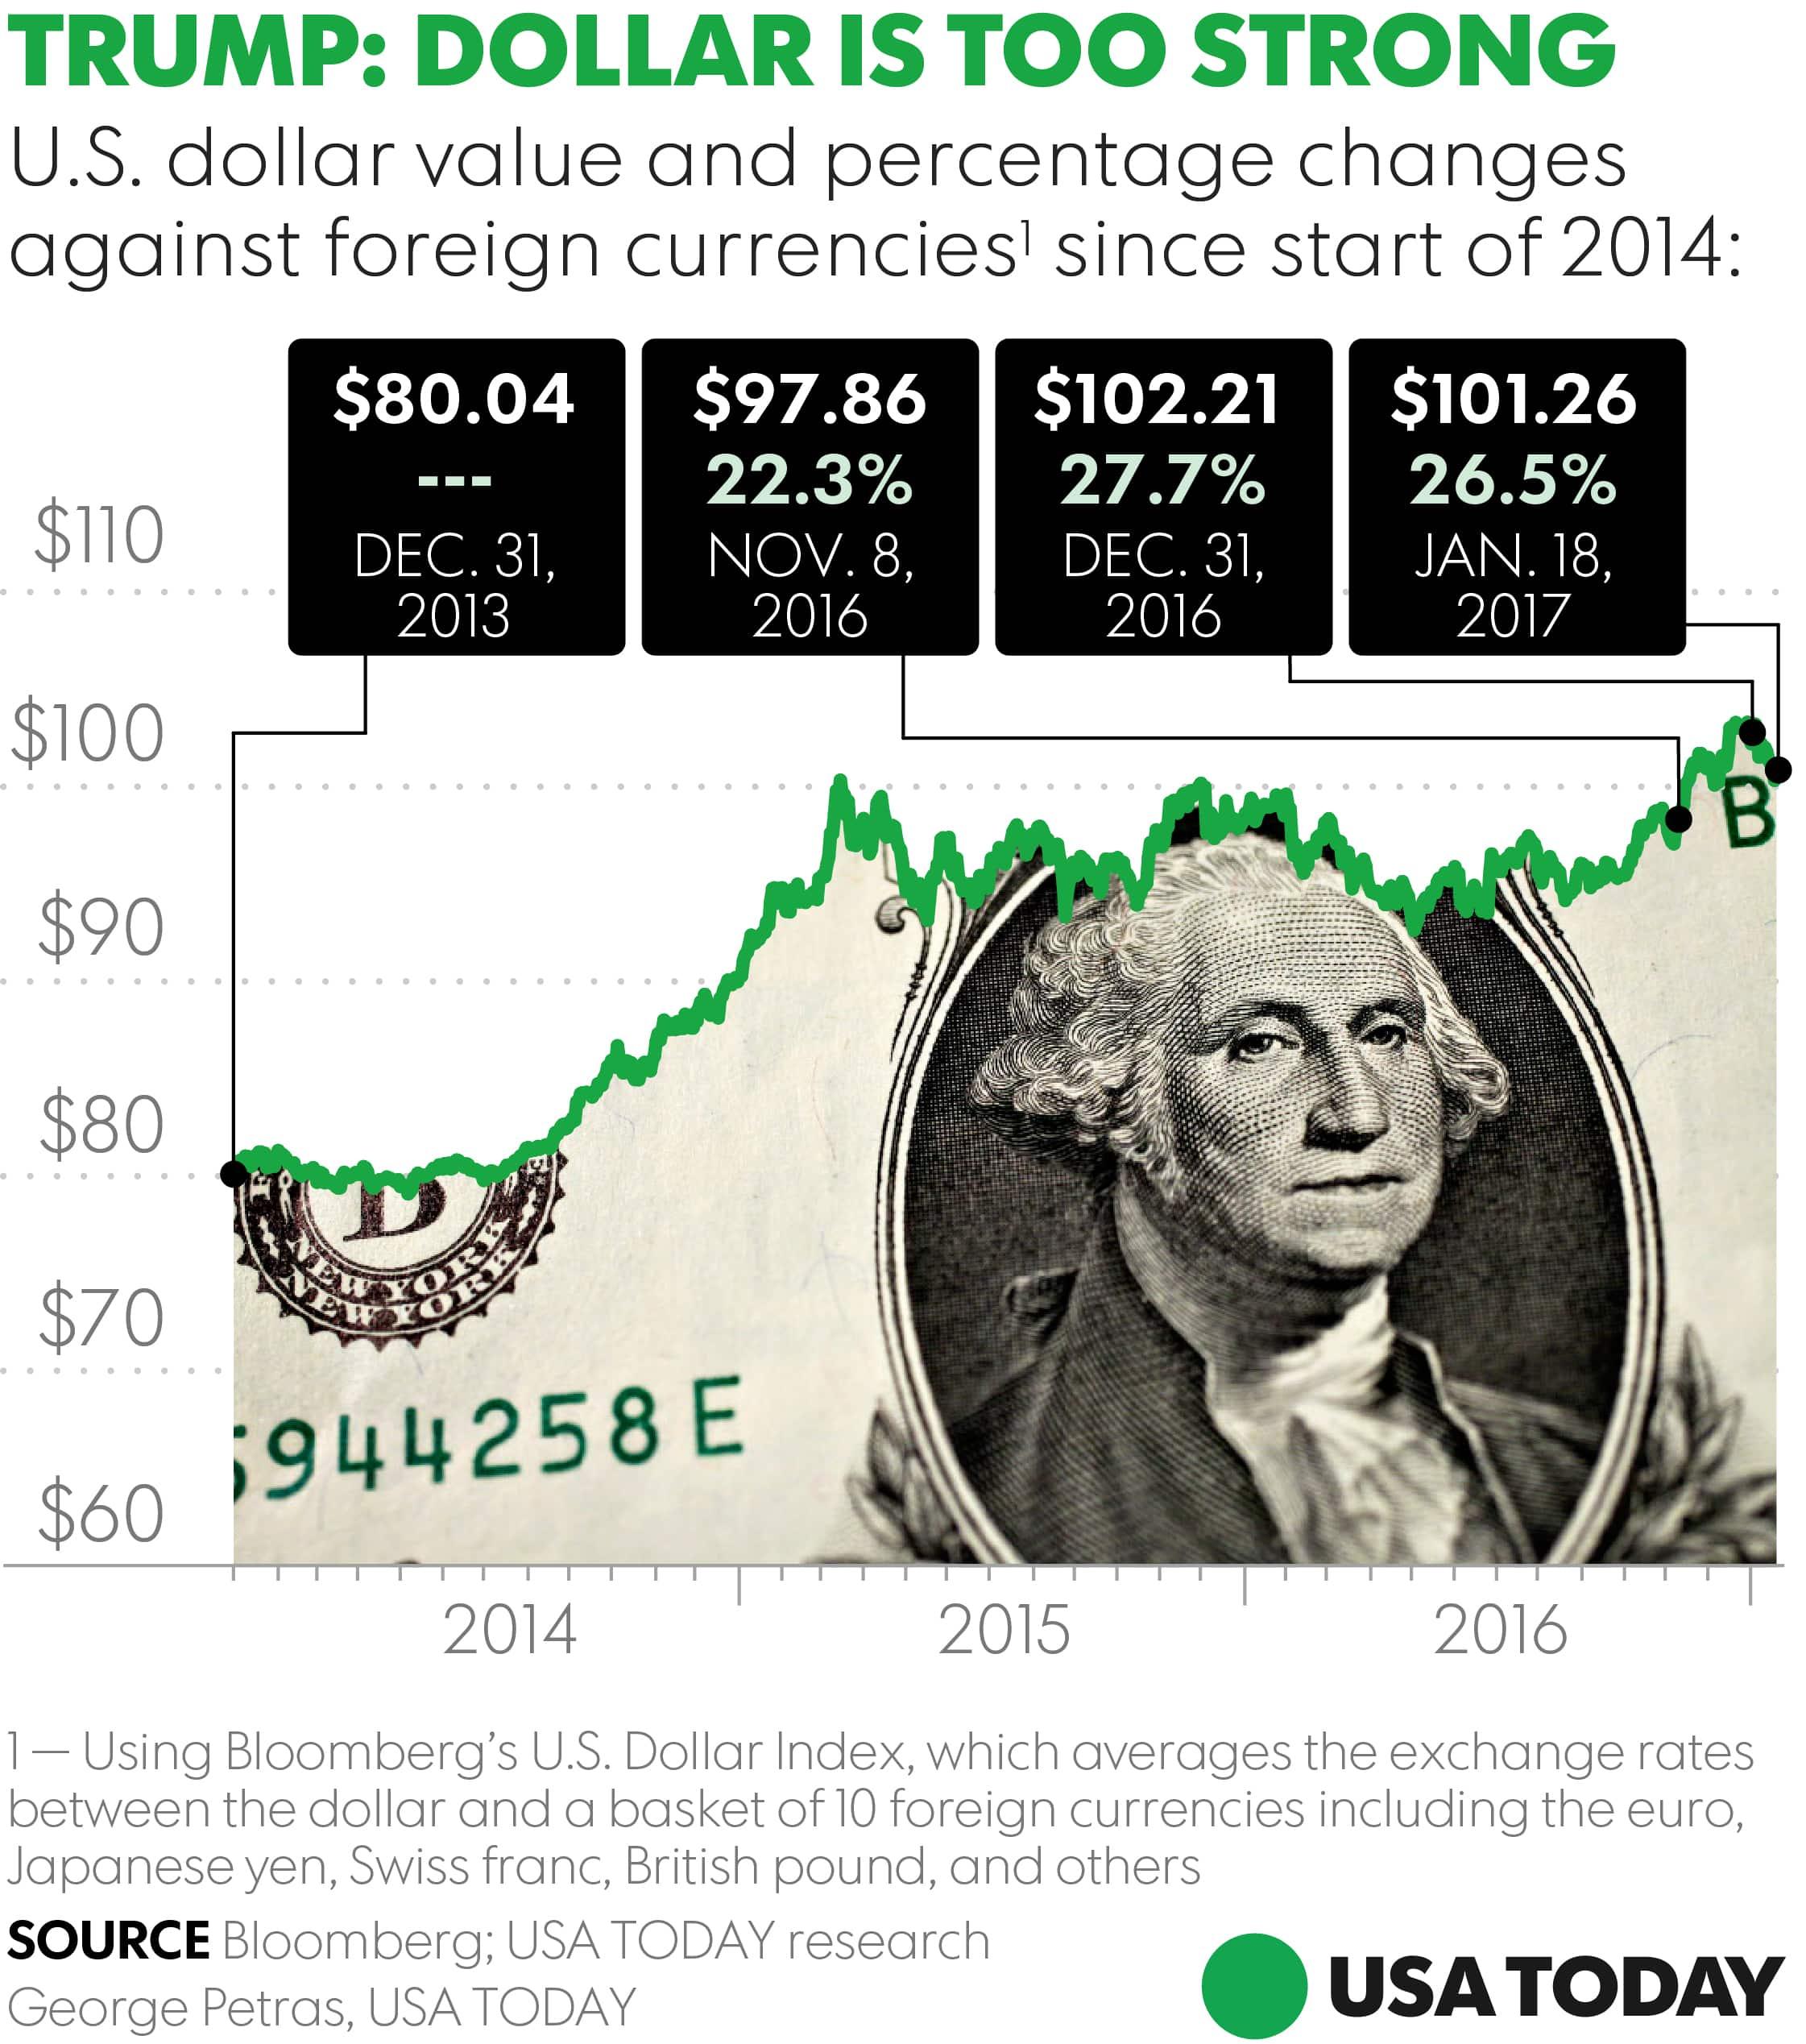 Trump-Dollar دونالد ترامب ورغبته في دولار ضعيف ينافس اليوان الصيني والين الياباني